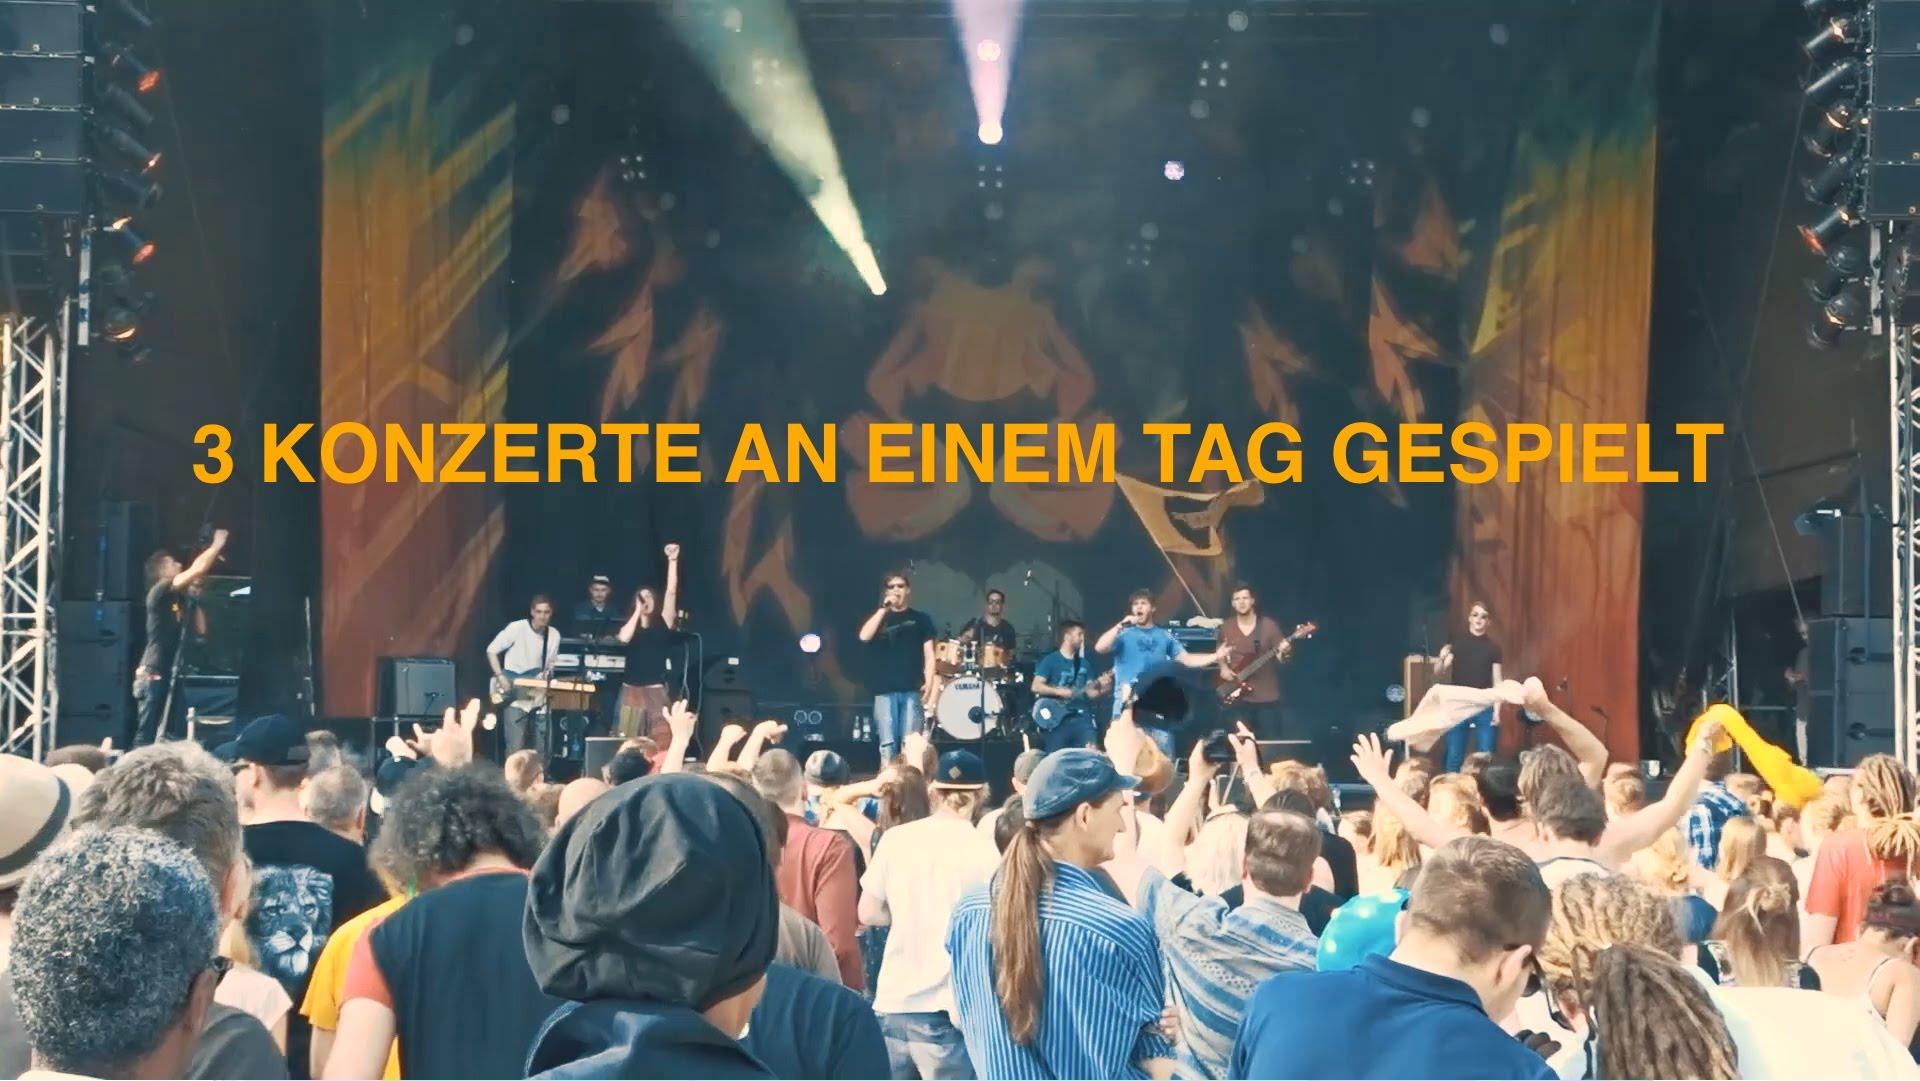 Skankin Sun @ Ruhr Reggae Summer - Dortmund 2016 [5/27/2016]